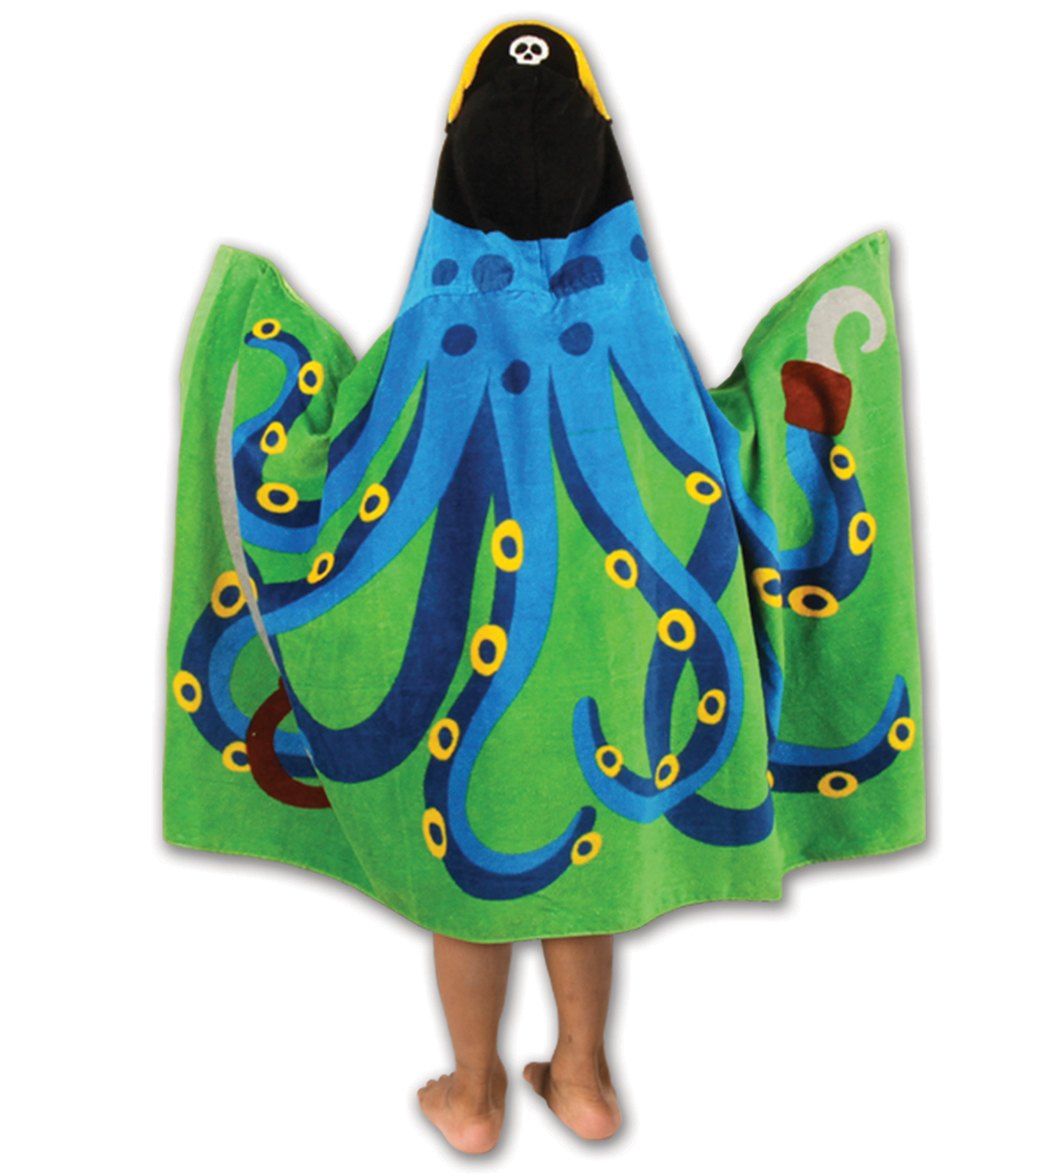 3a0e8b6e09c Stephen Joseph Kids  Octopus Hooded Towel at SwimOutlet.com